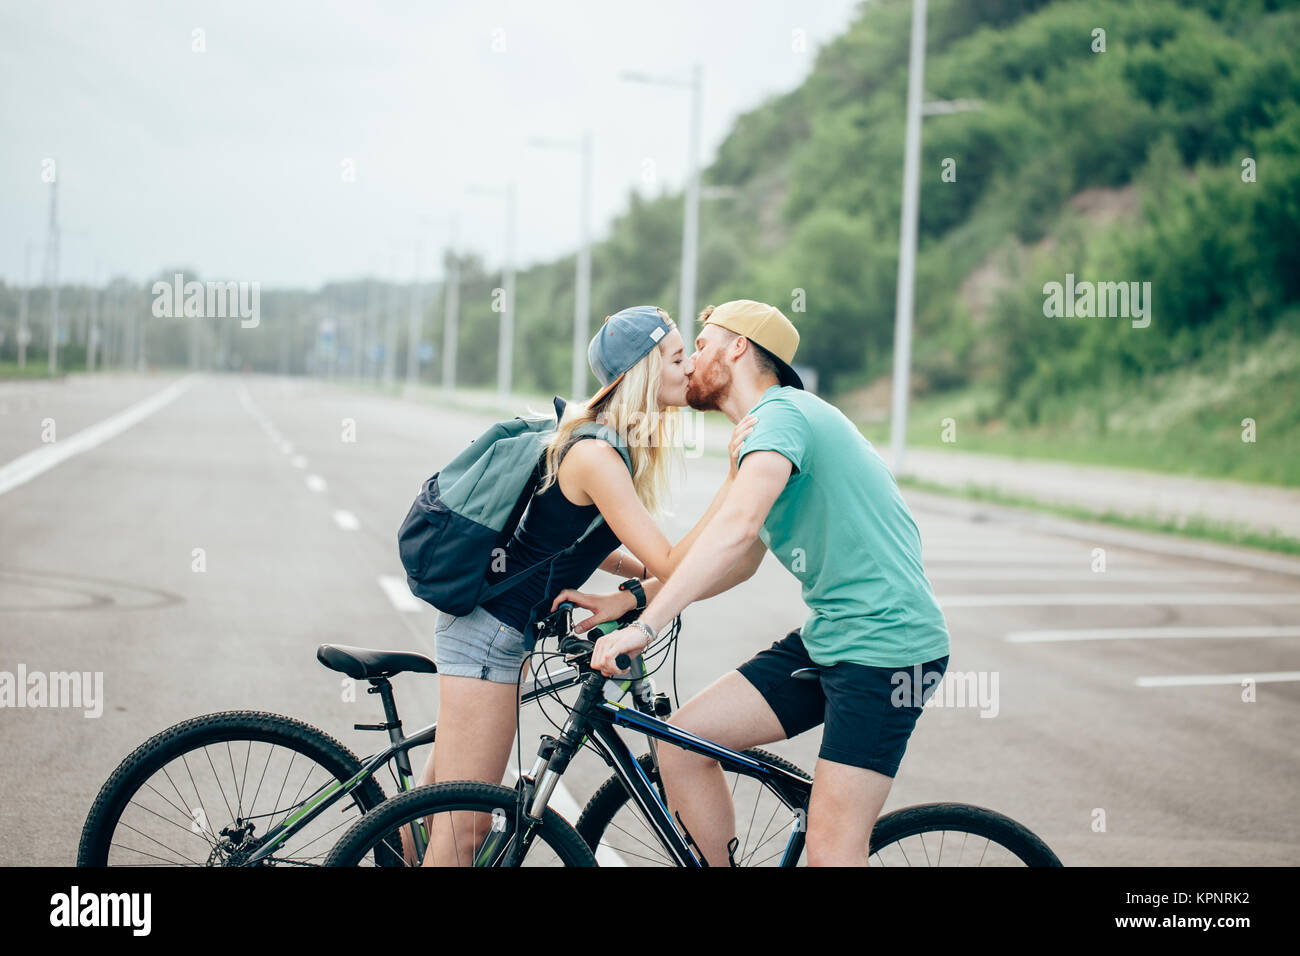 Deportes romántica pareja besándose contra fondo borroso con bicicletas Imagen De Stock